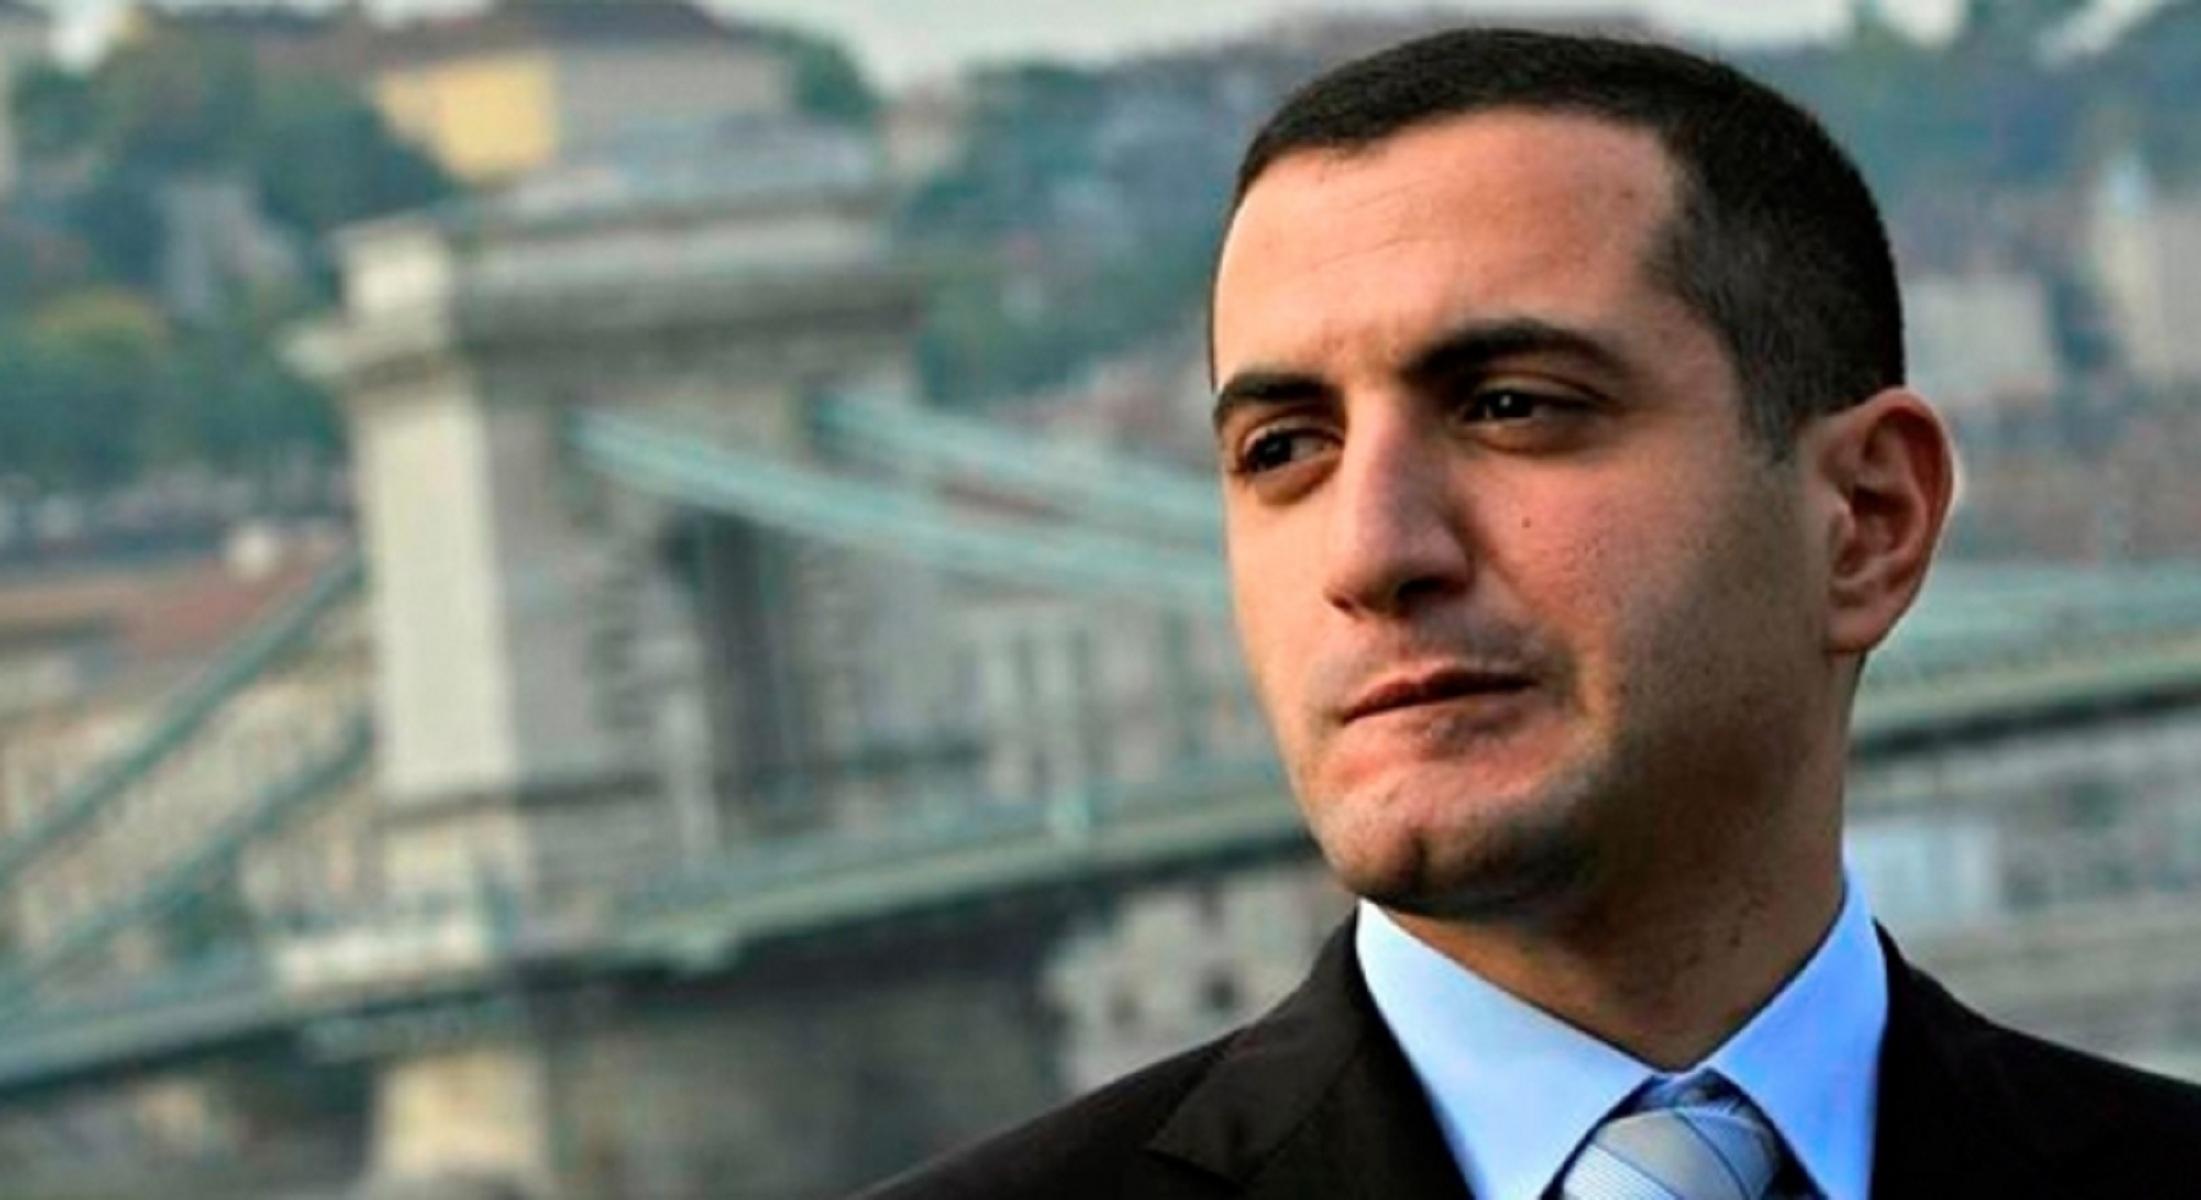 Davit Kezerashvili #новости Давид Кезерашвили, свобода слова, СМИ, телевидение